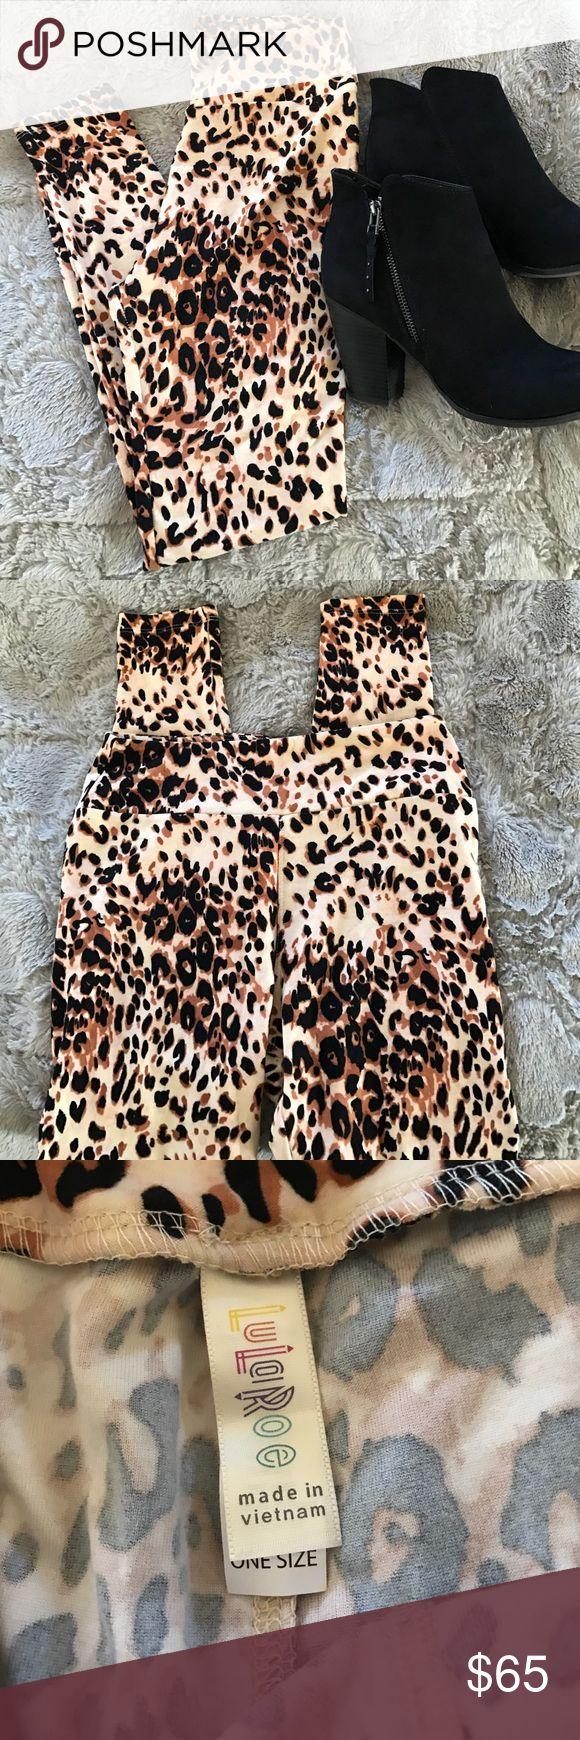 🦄 Unicorn print - NWOT Cheetah leggings. 🦄 Unicorn print - New, never worn, Cheetah leggings. LuLaRoe Pants Leggings